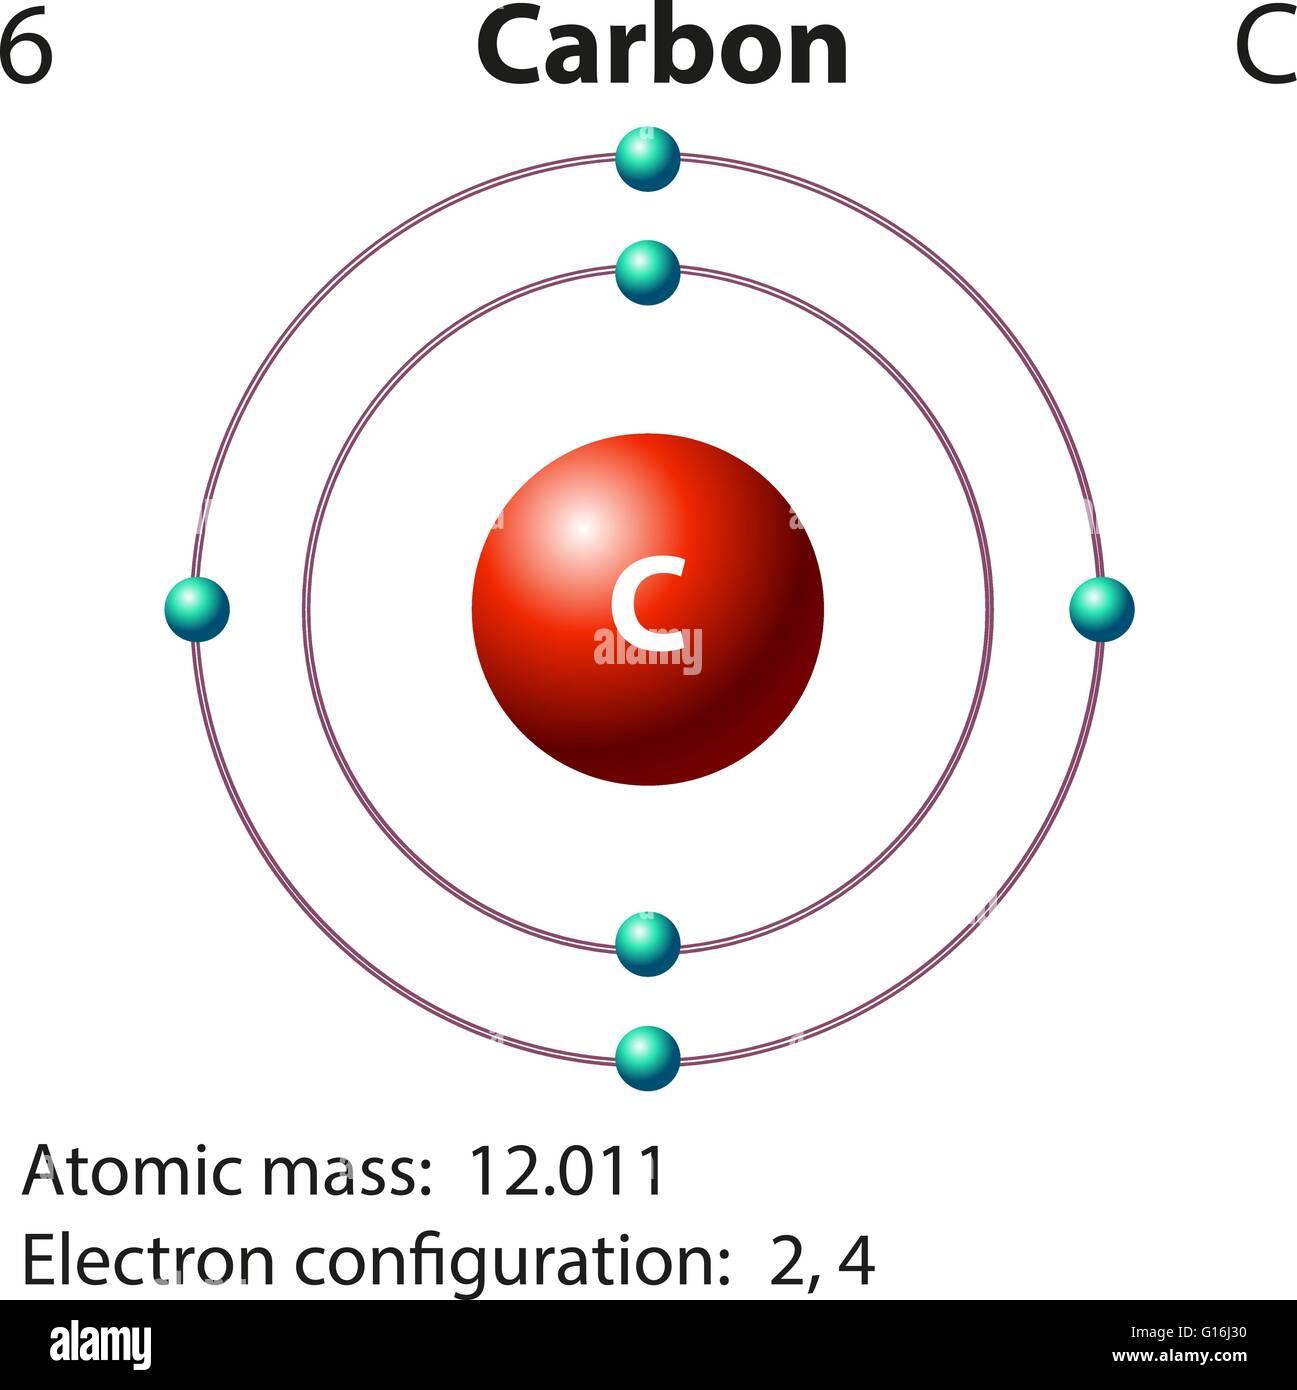 Carbon atom diagram fotos carbon atom diagram imagens de stock alamy diagrama representao do elemento carbono ilustrao imagens de stock ccuart Image collections